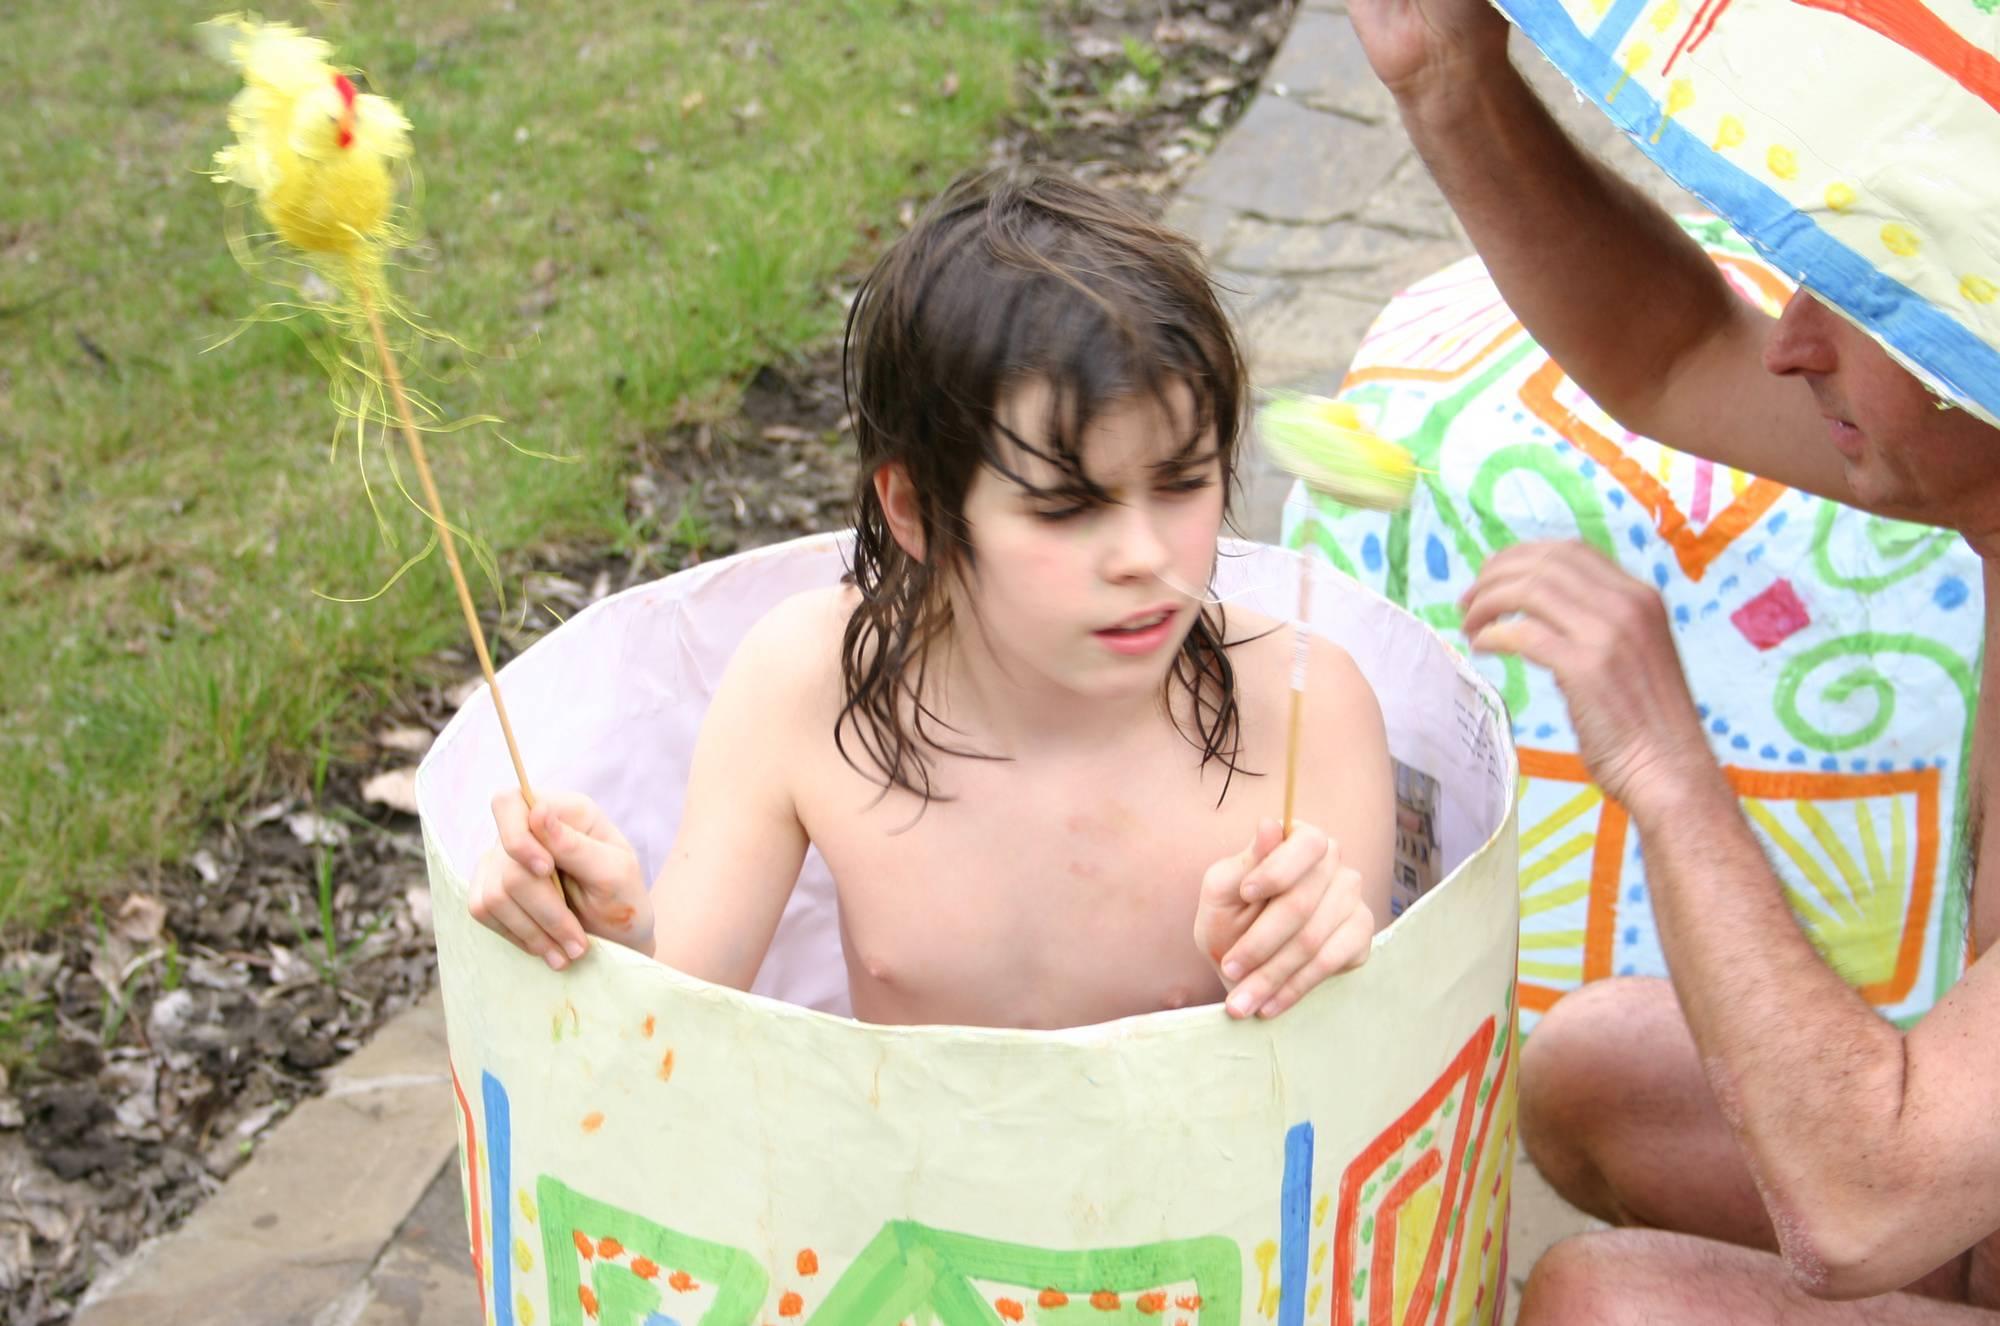 Nudist Photos Easter 2X Eggs Outdoors - 2